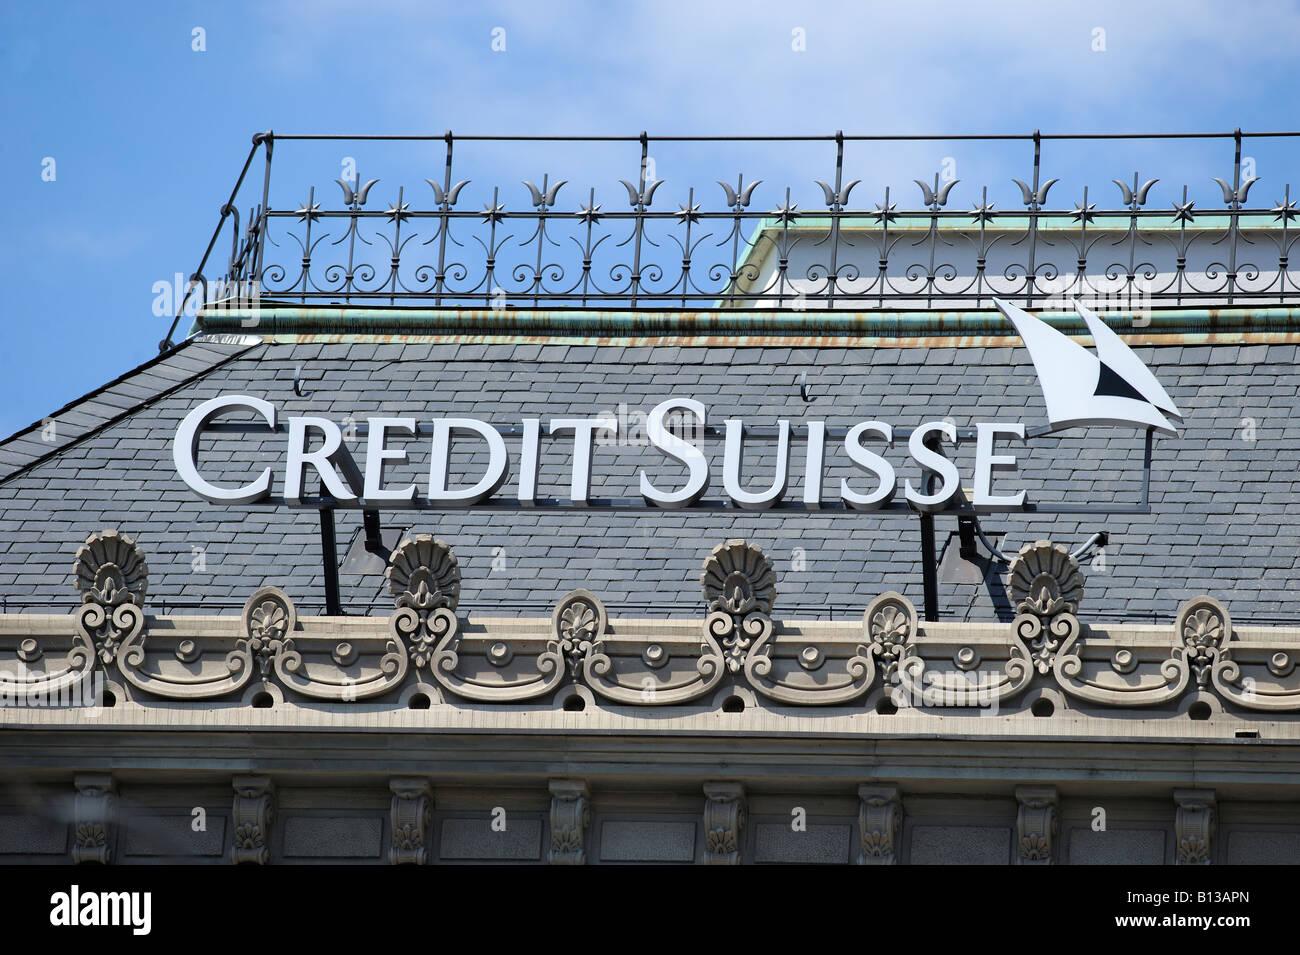 credit suisse logo on top of the headquarter in zurich, switzerland - Stock Image